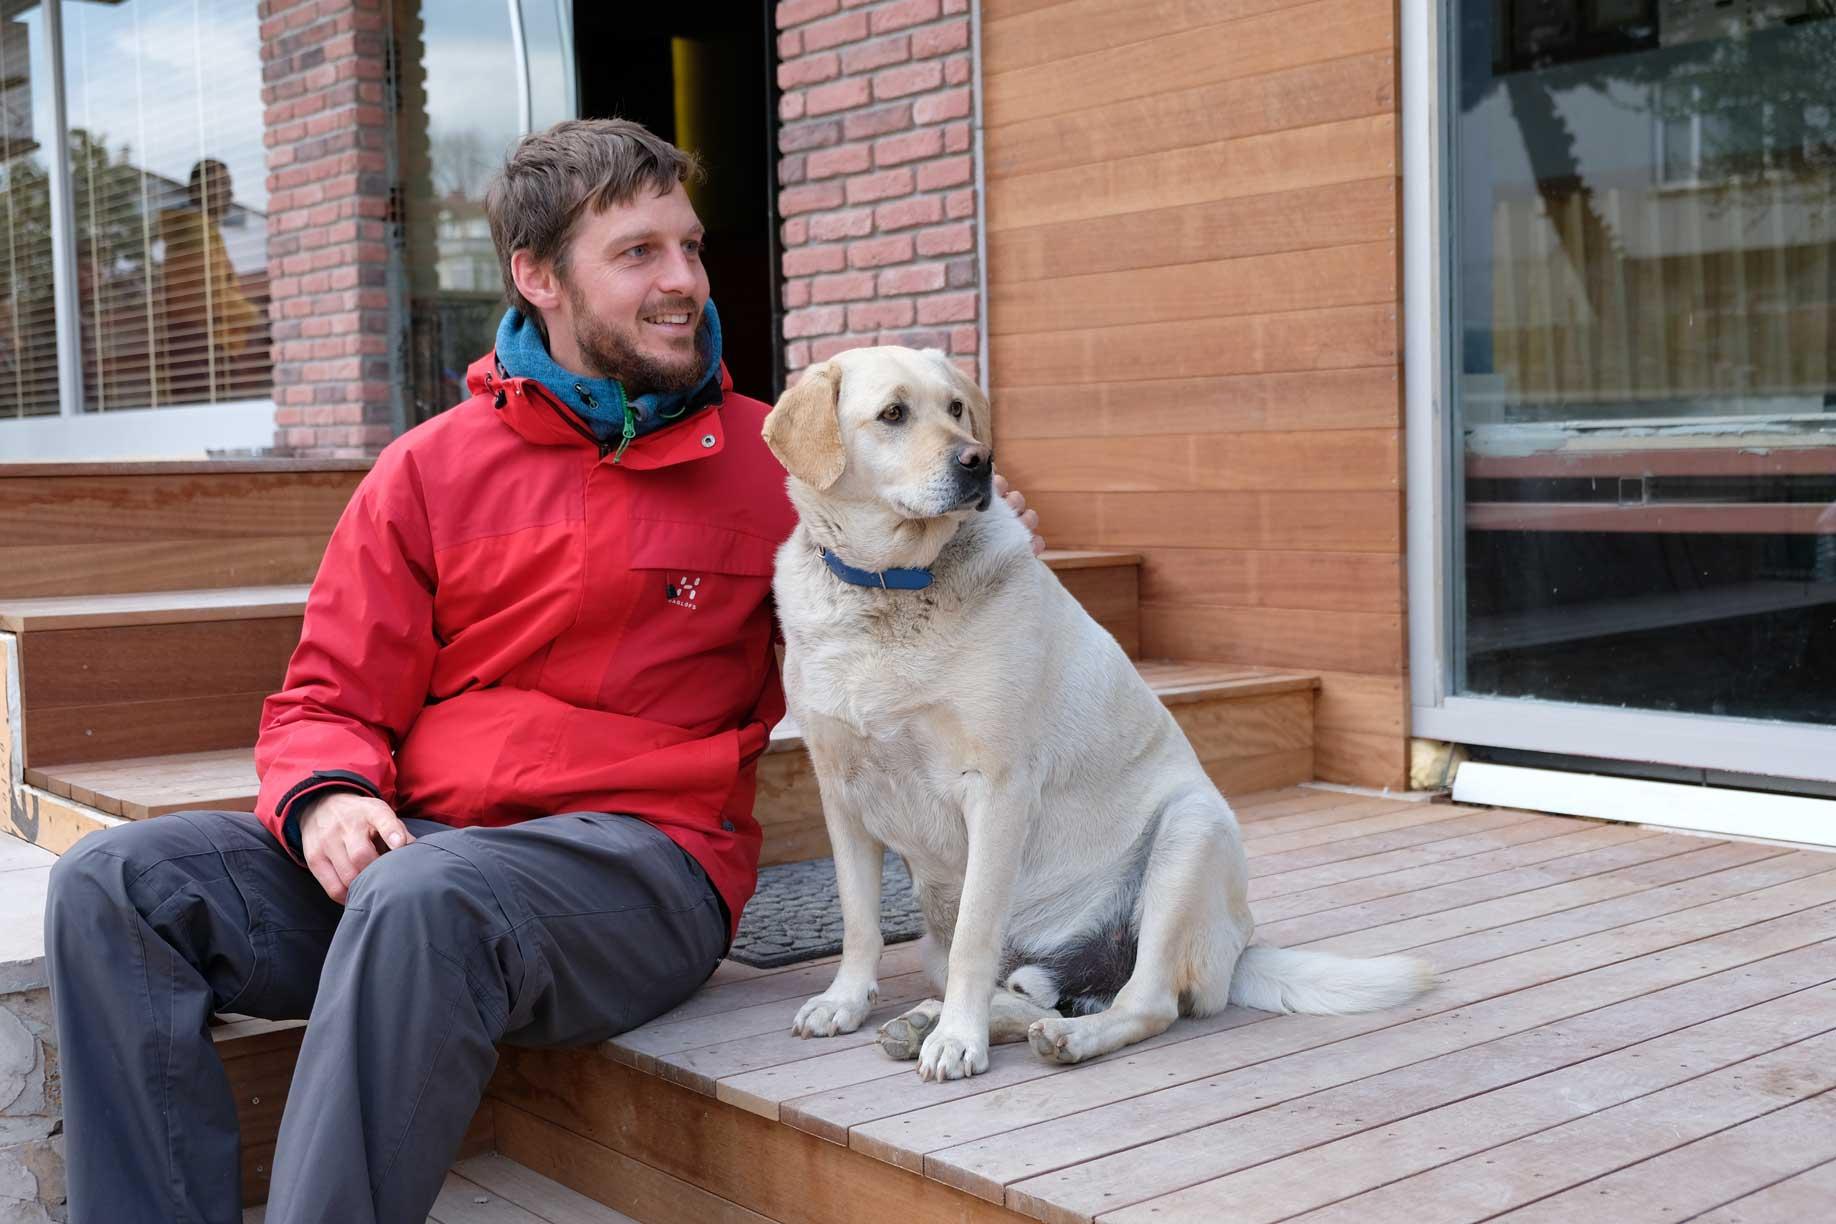 Sebastian sitzt neben einem Hund